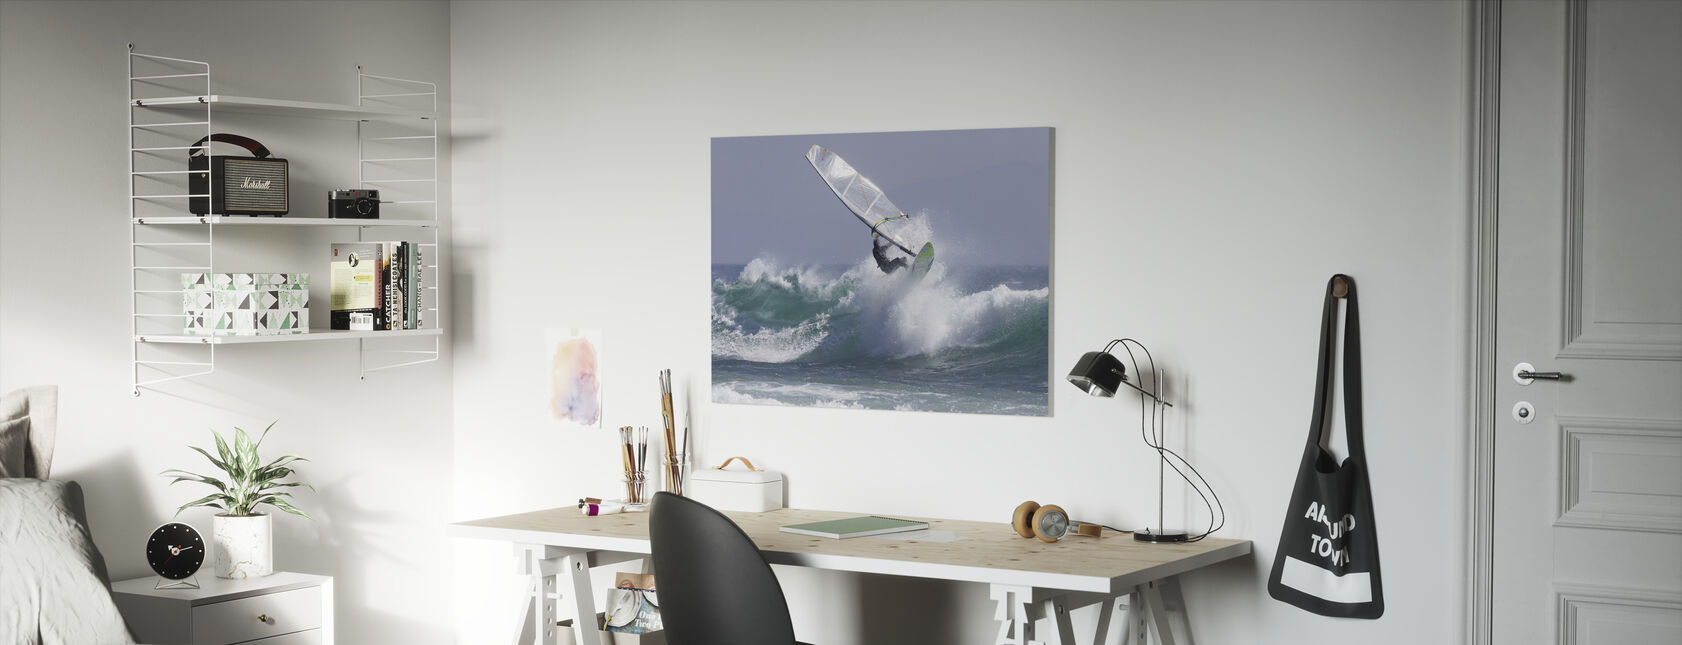 Windsurfen - Leinwandbild - Kinderzimmer